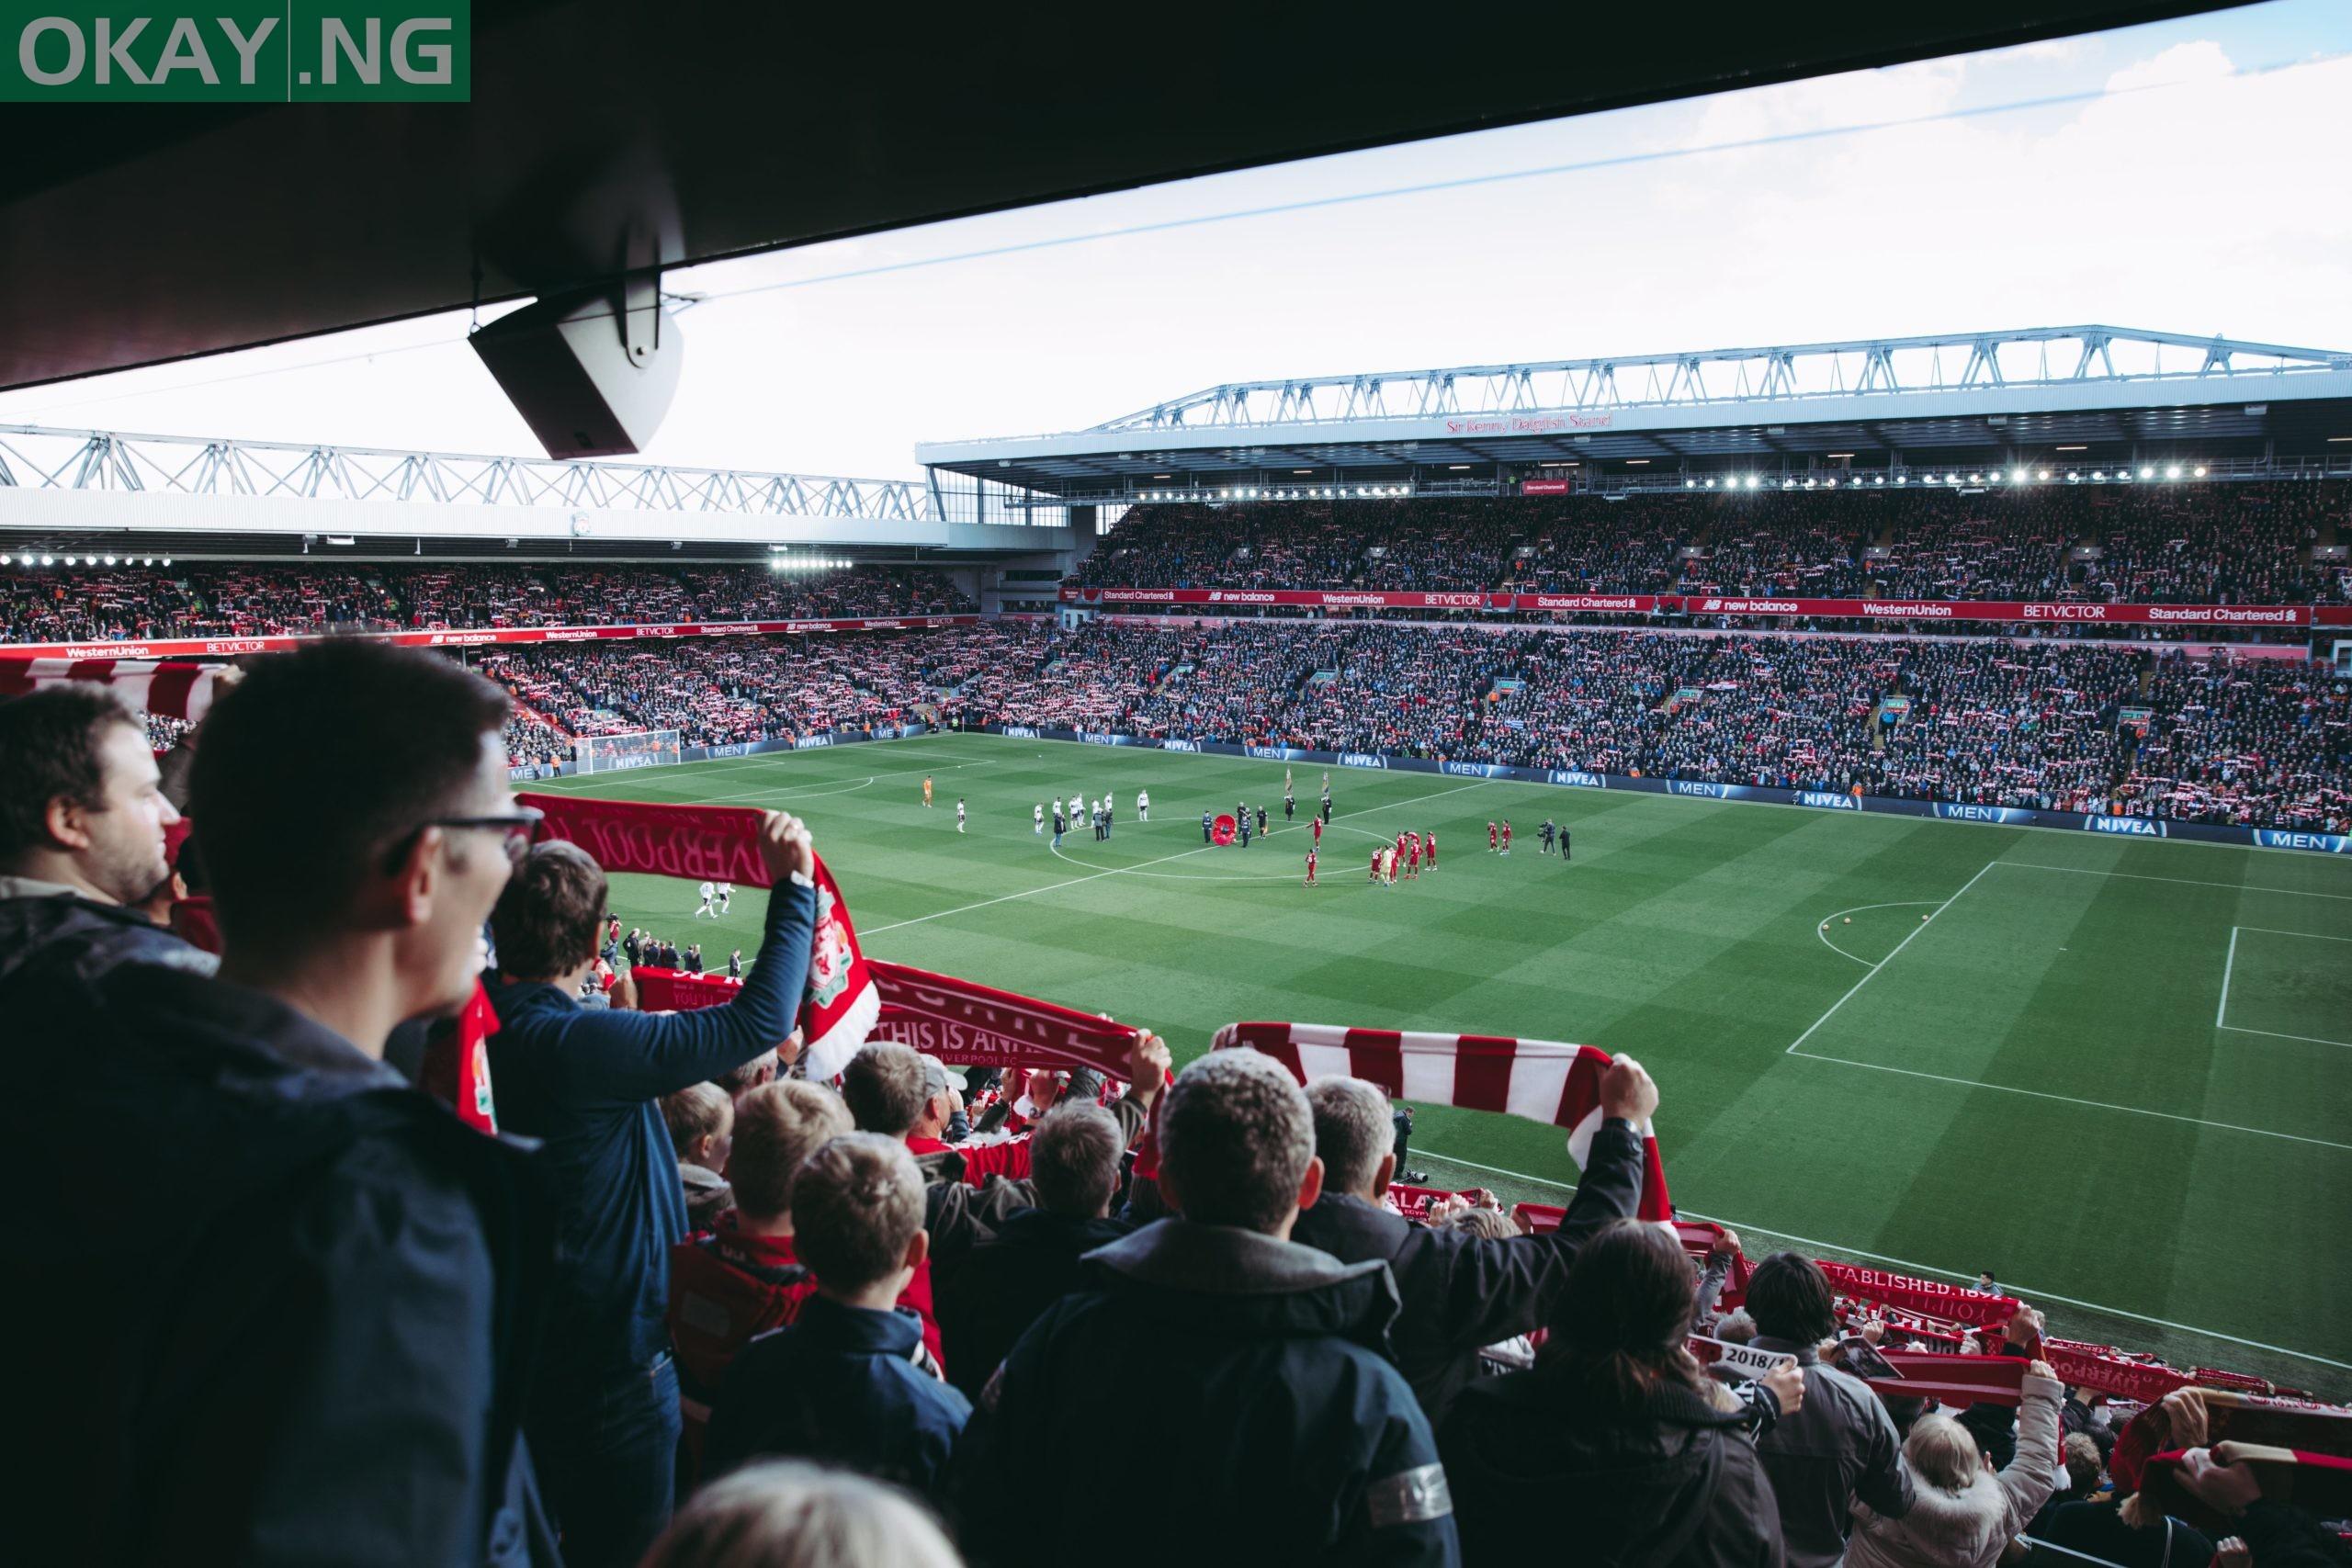 Liverpool's emblematic Anfield Stadium